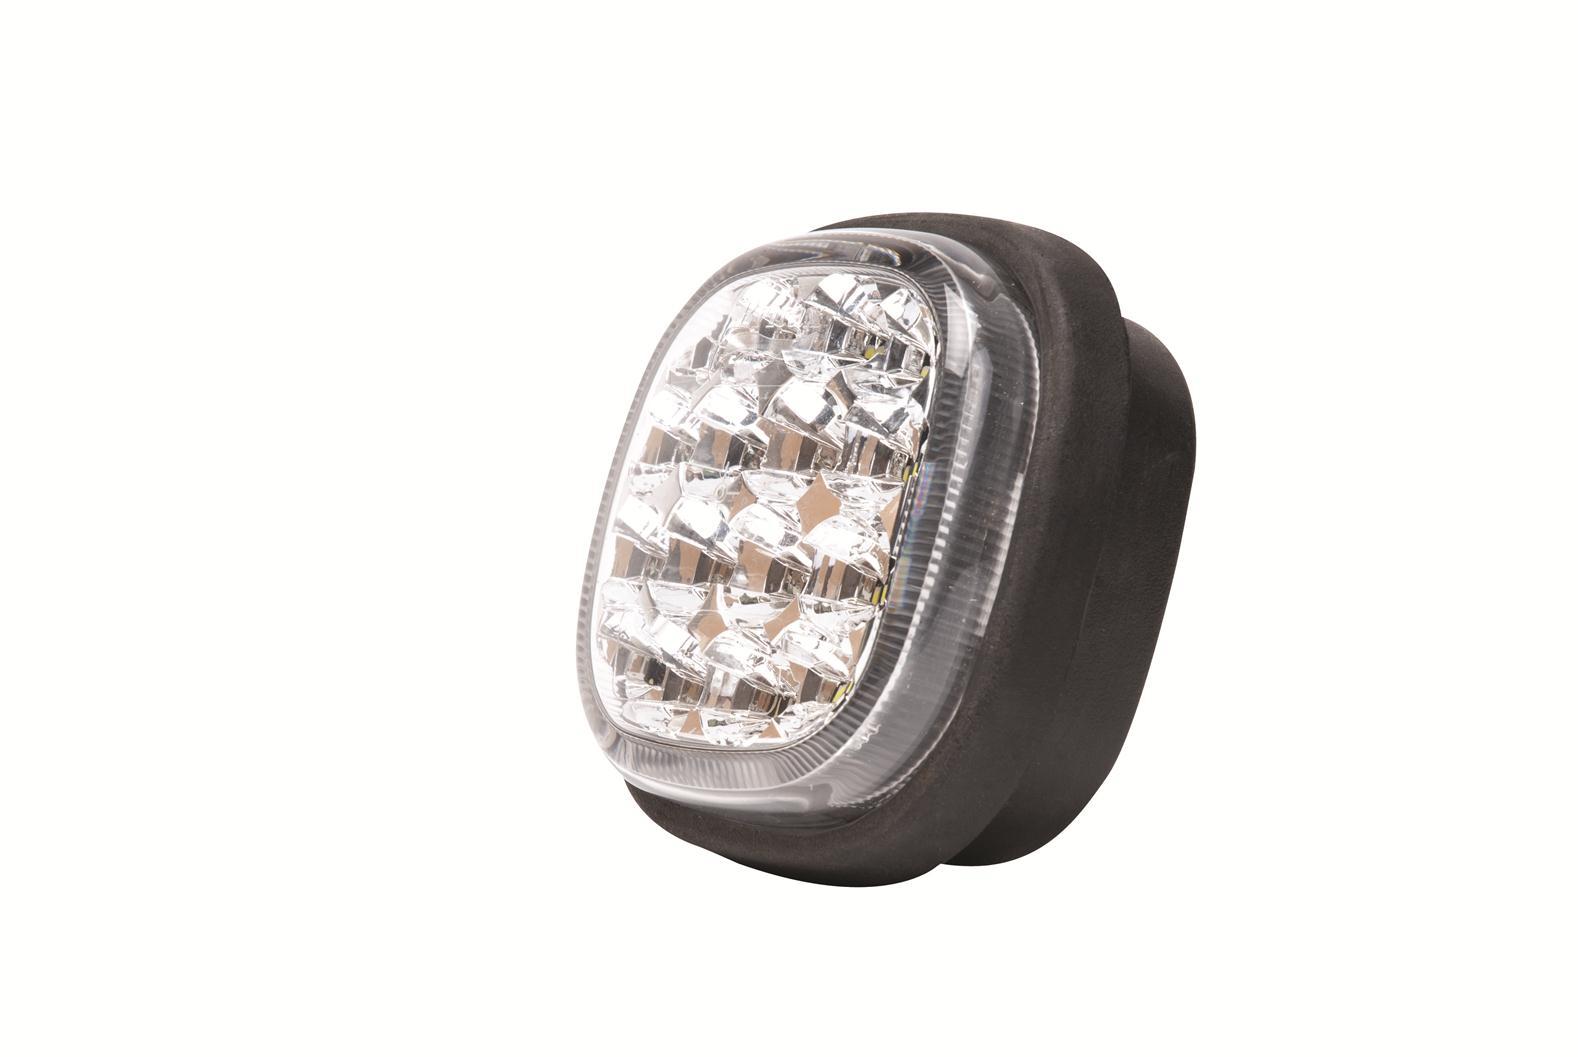 Britax L11 LED rear lamps